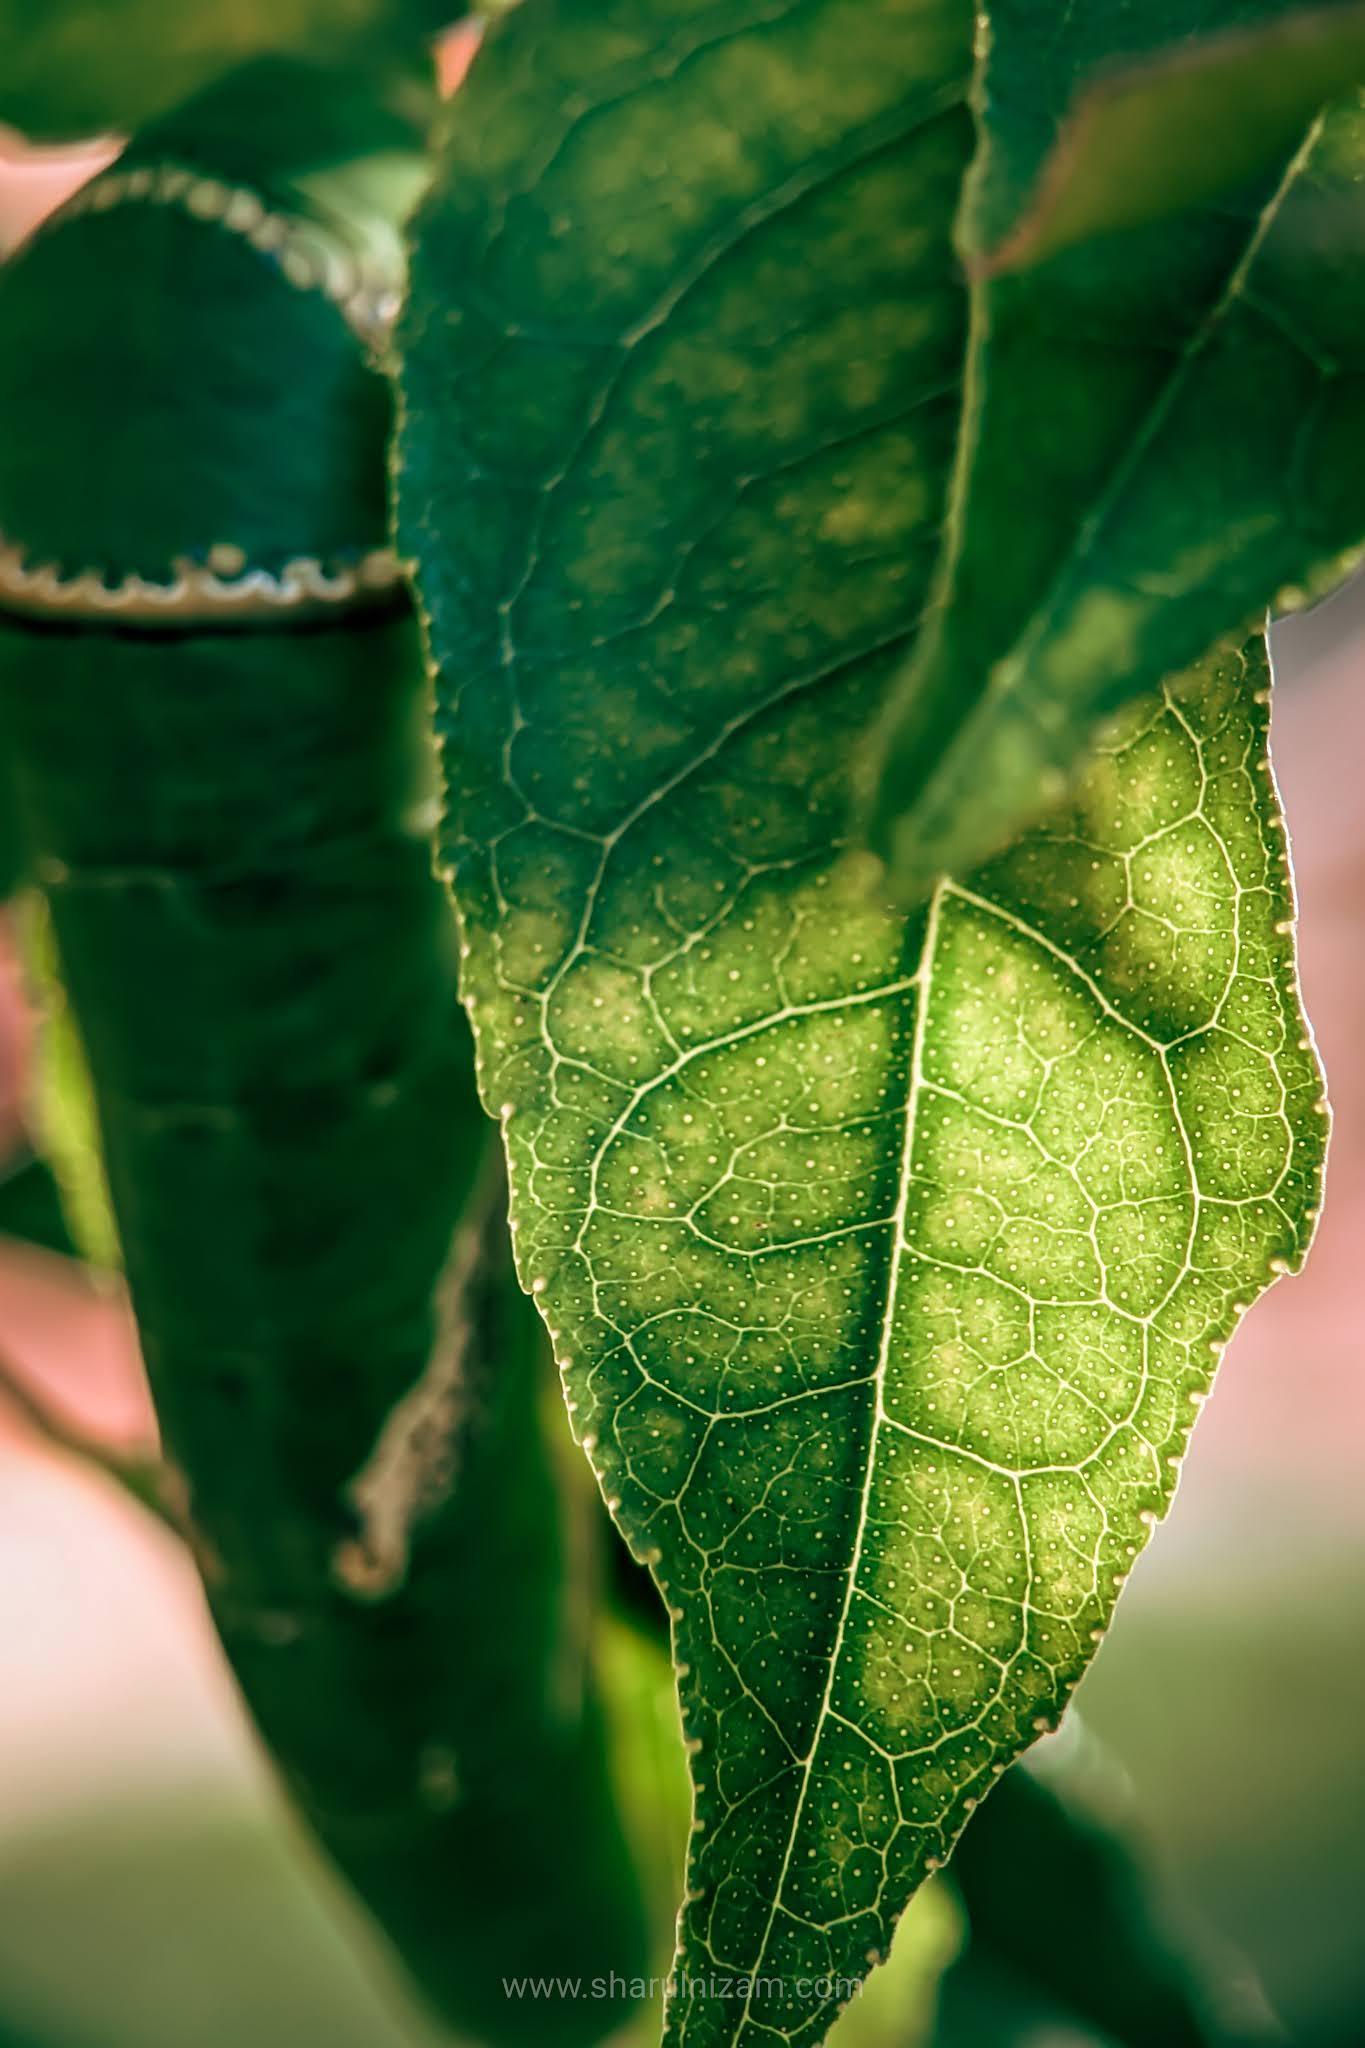 10 Gambar Macro Photography Di Halaman Rumah (Lensbong Nikon 35 mm & Samsung A52)